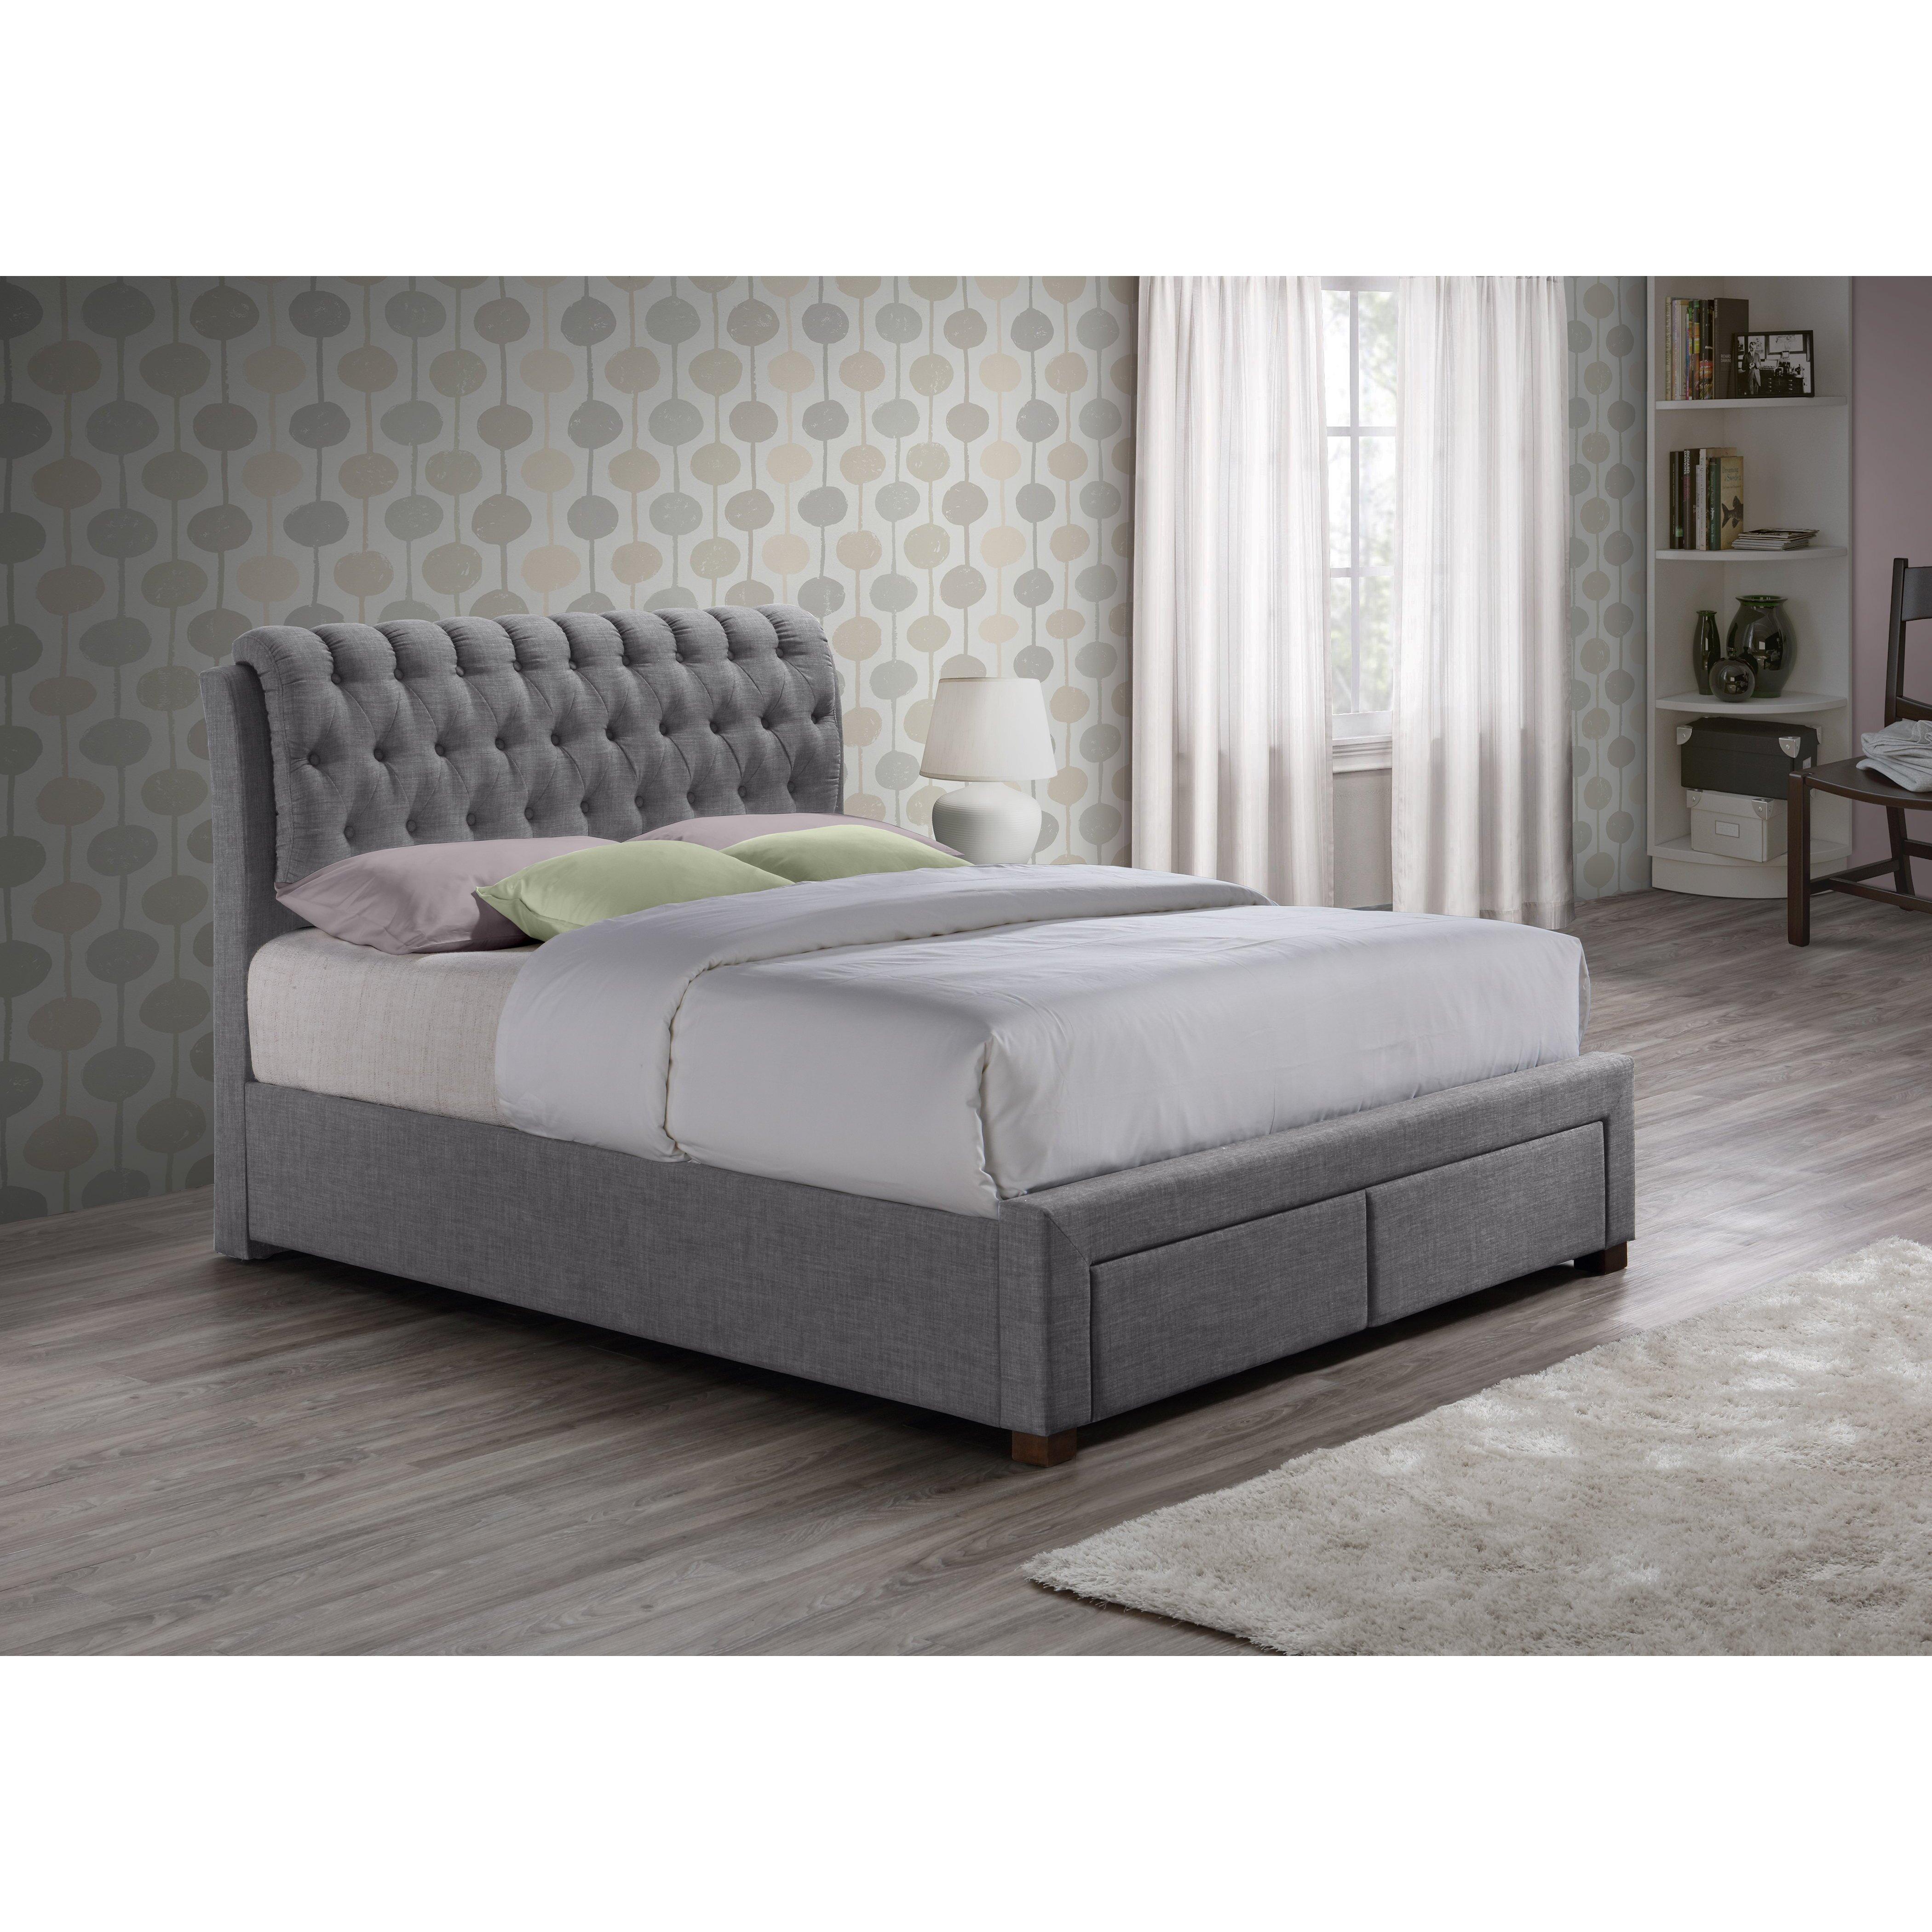 Home loft concept valerie storage bed reviews wayfair uk for Home loft concept bunk bed